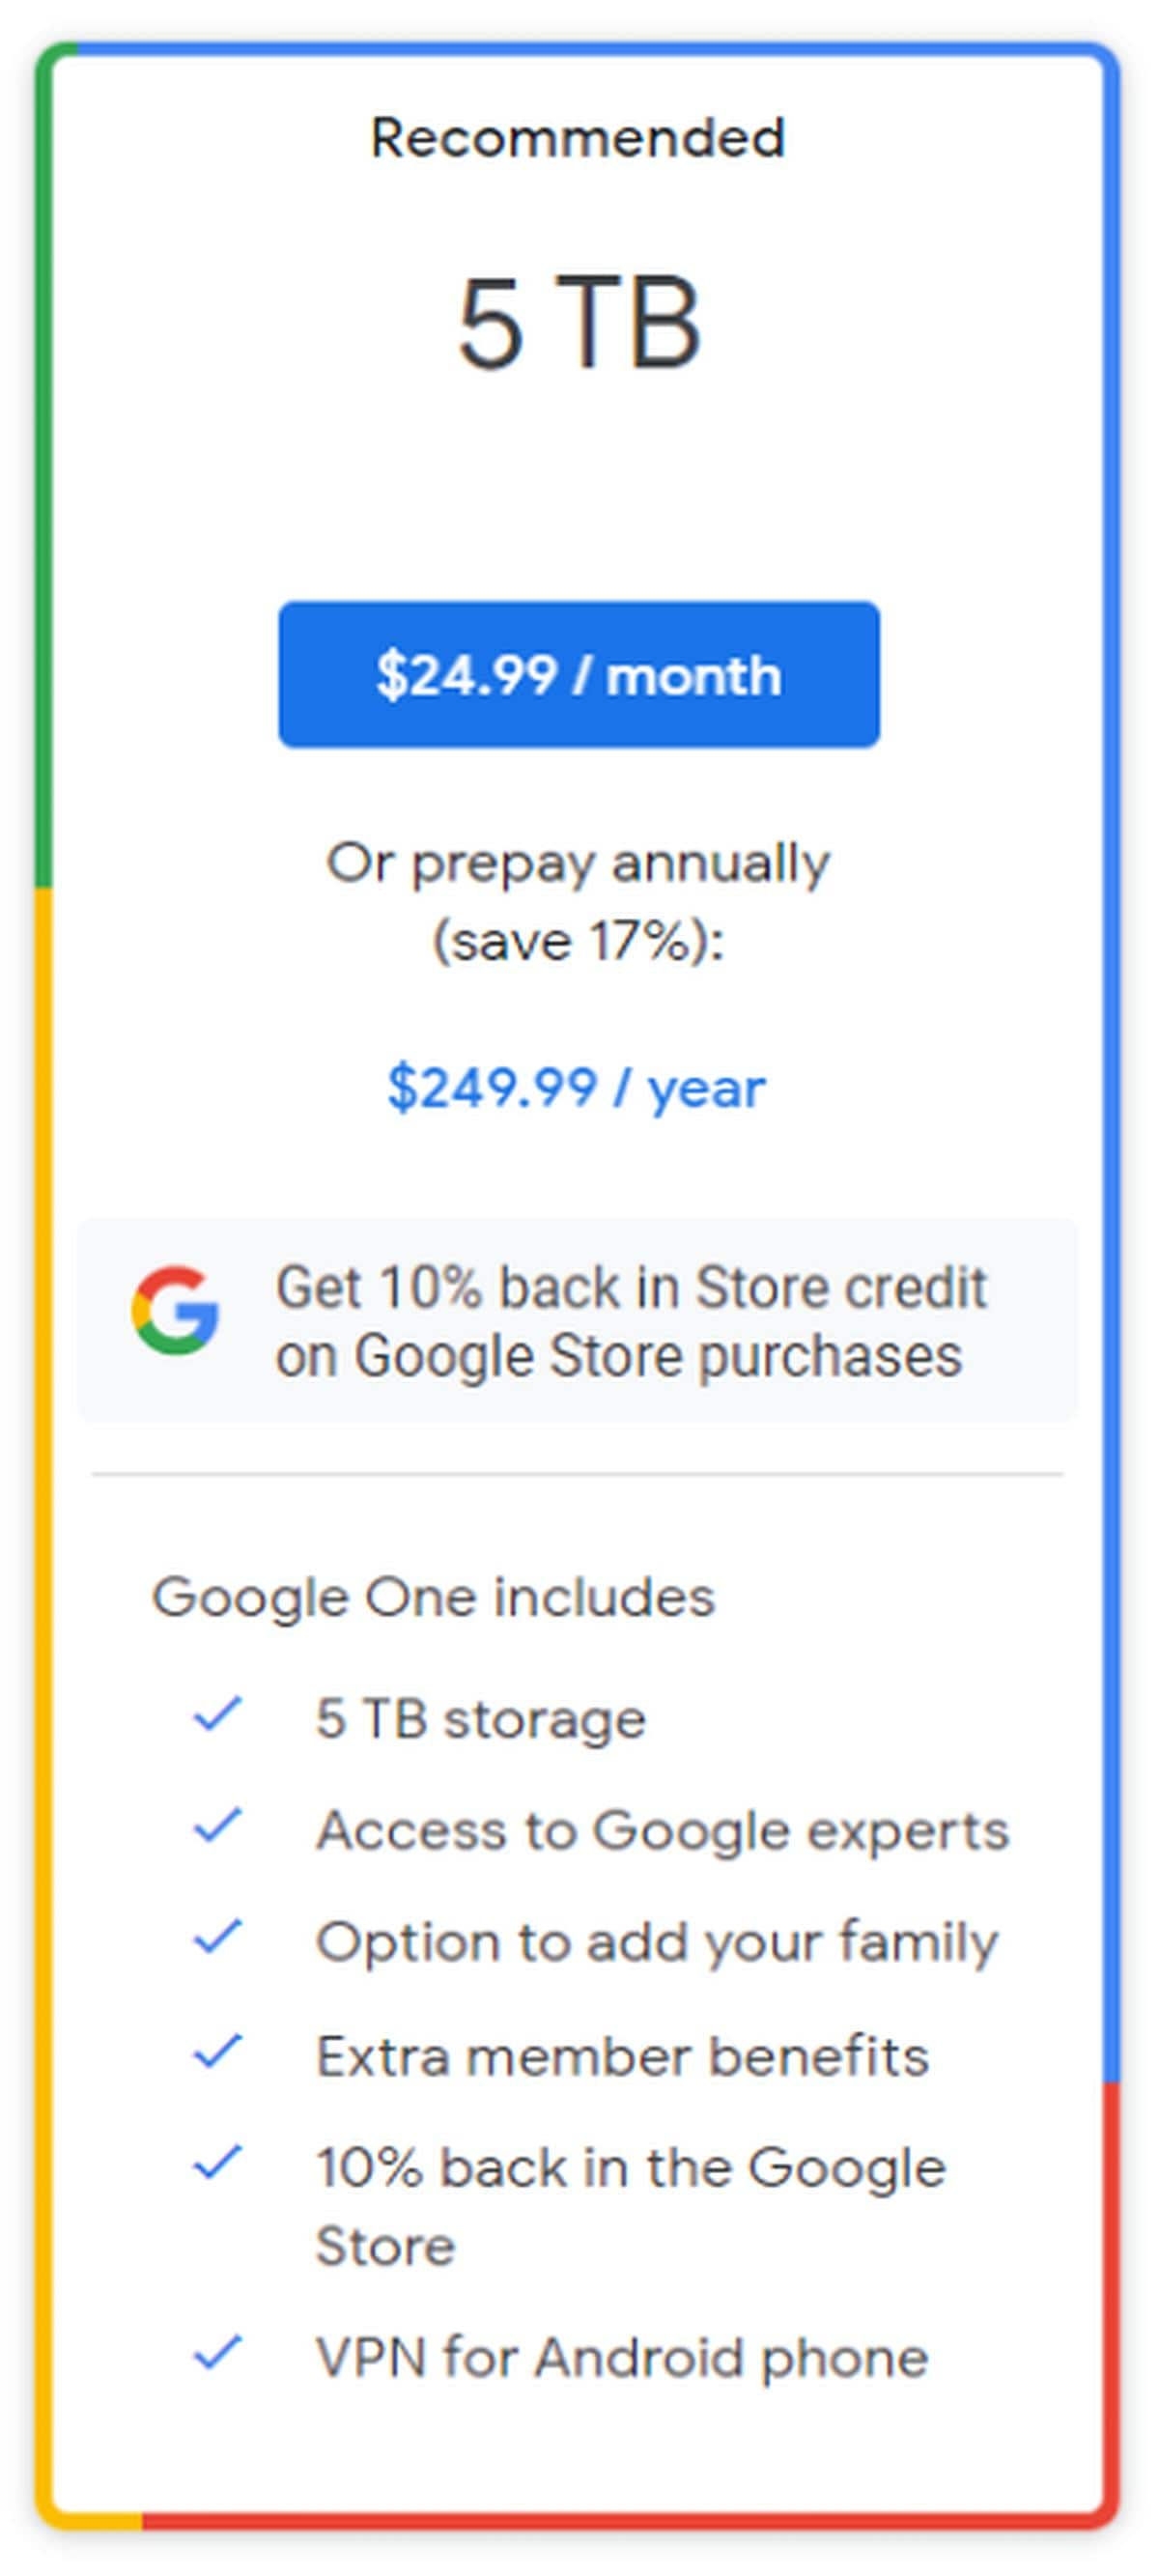 plano de armazenamento google one 5 TB 9to5google google_one_5tb_storage_plan_9to5google